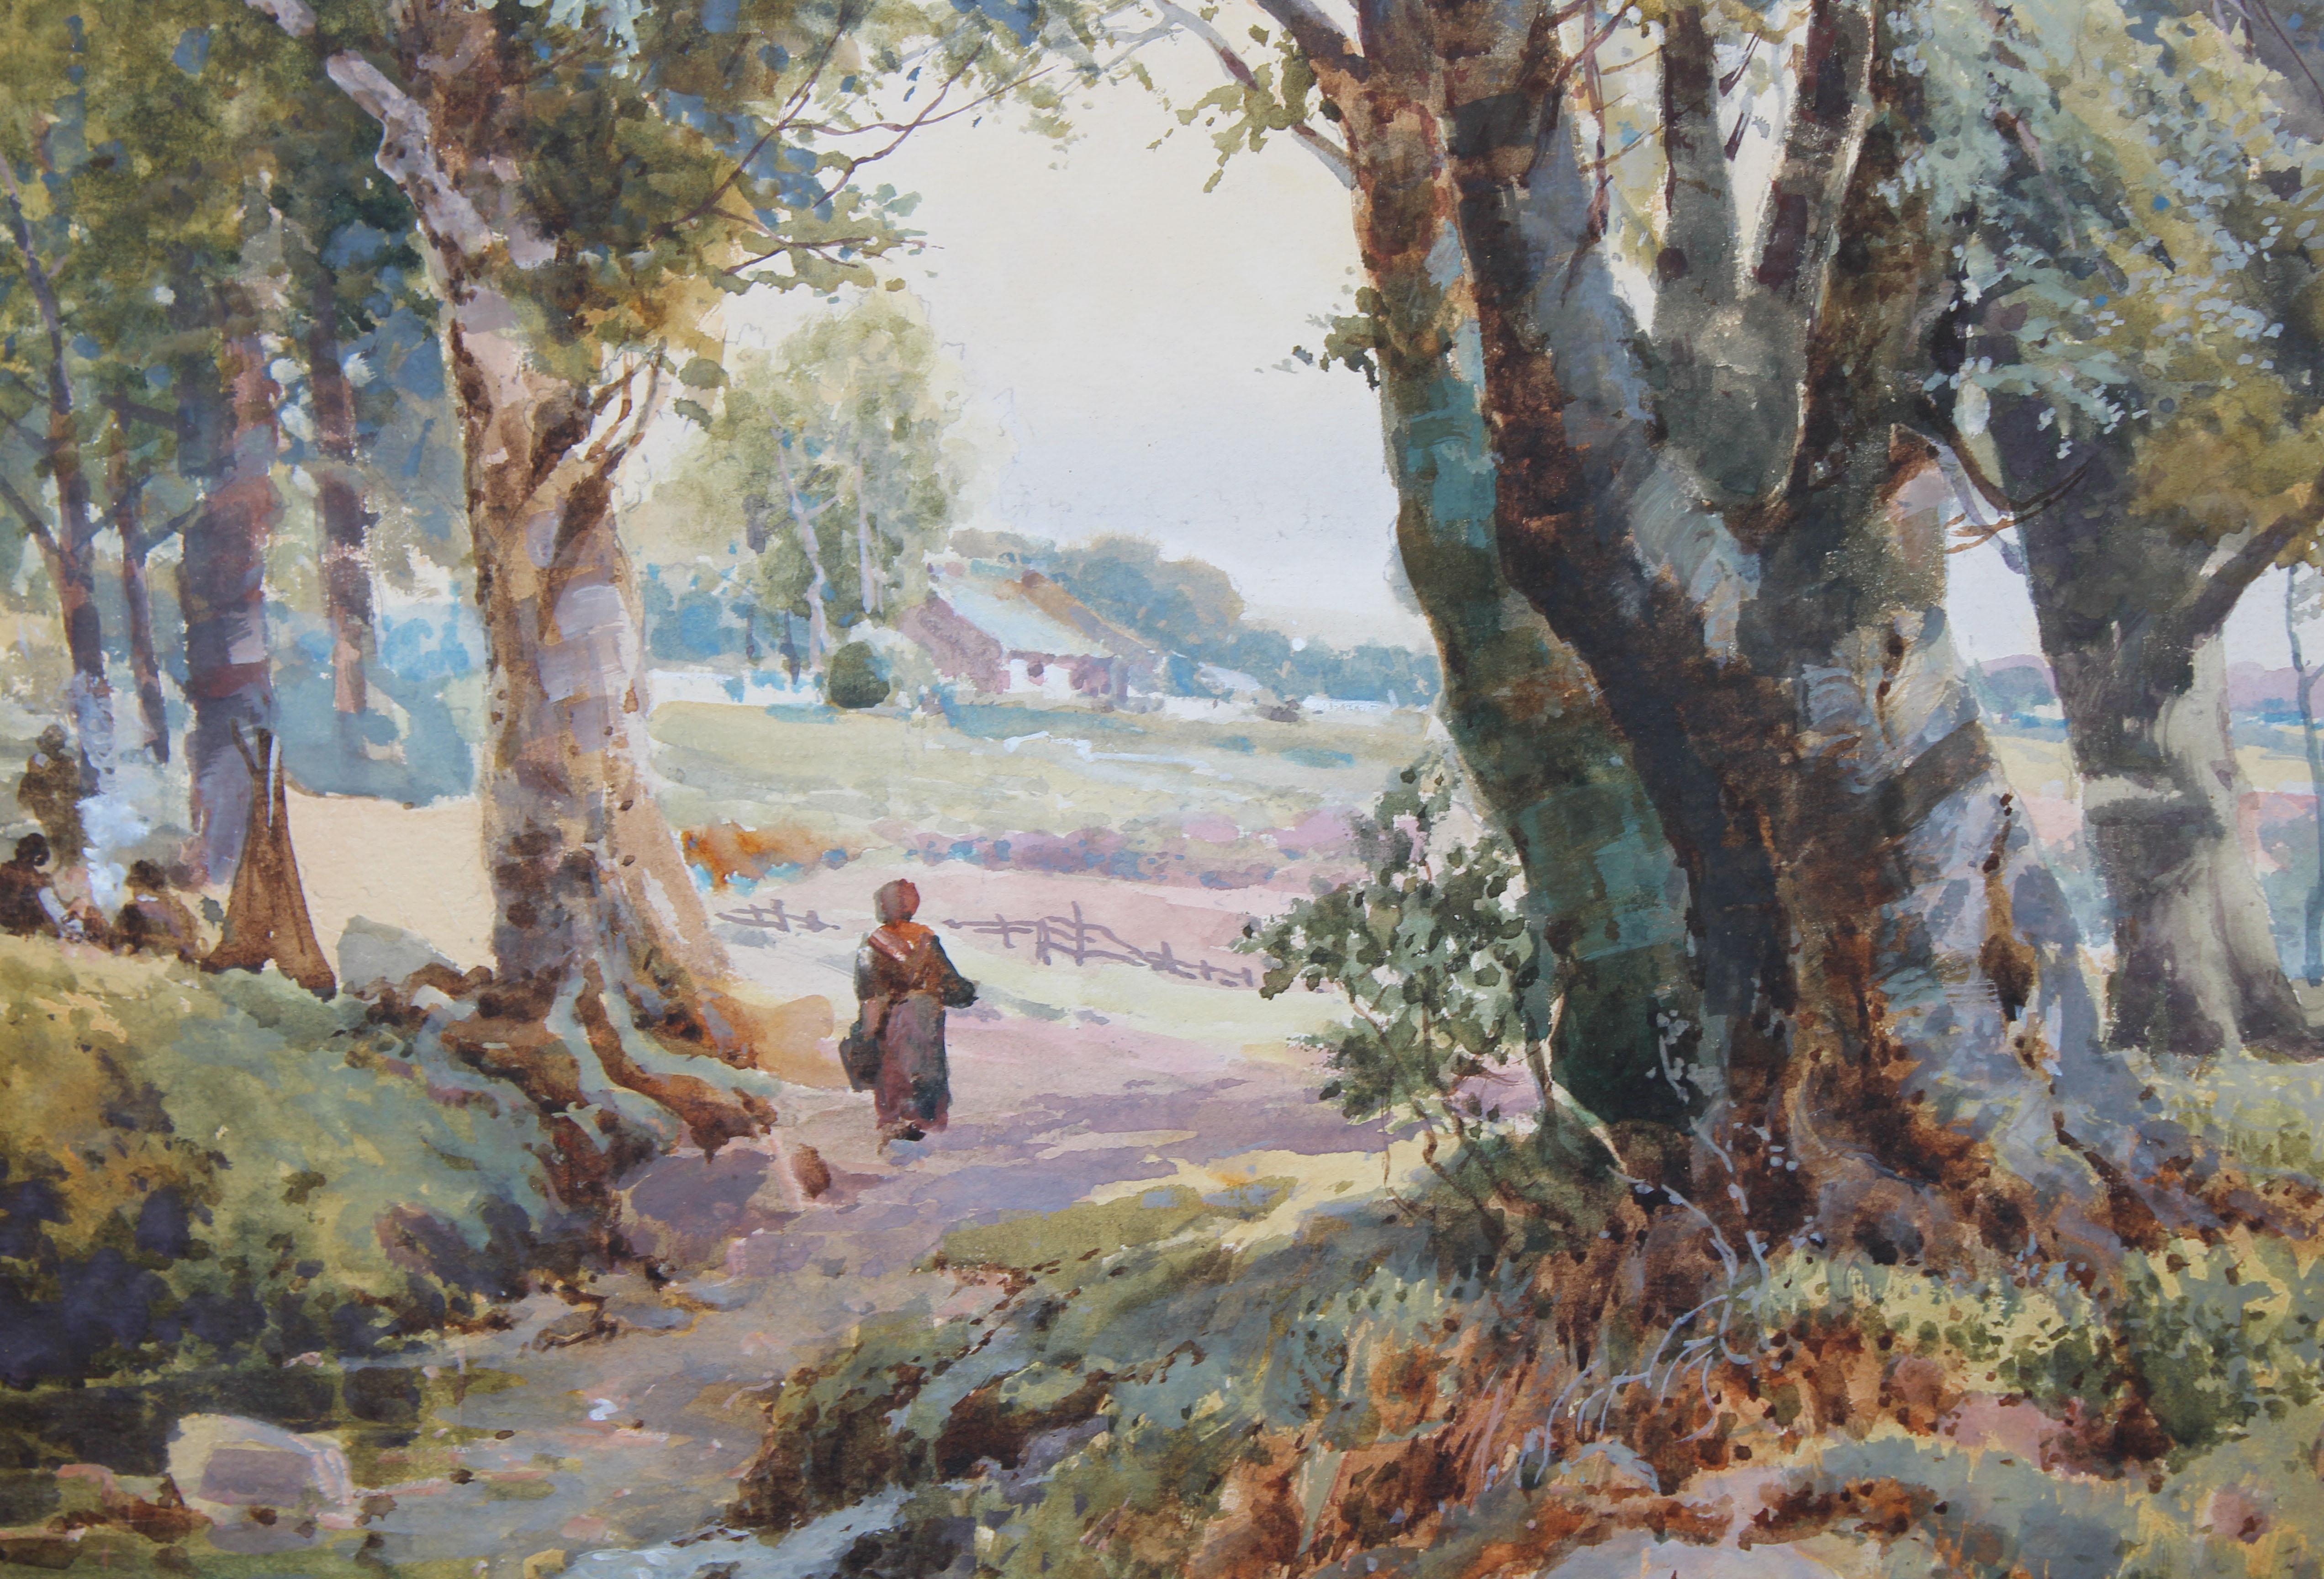 Lot 24 - Henri-Joseph Harpignies (France, 1819 - 1916)